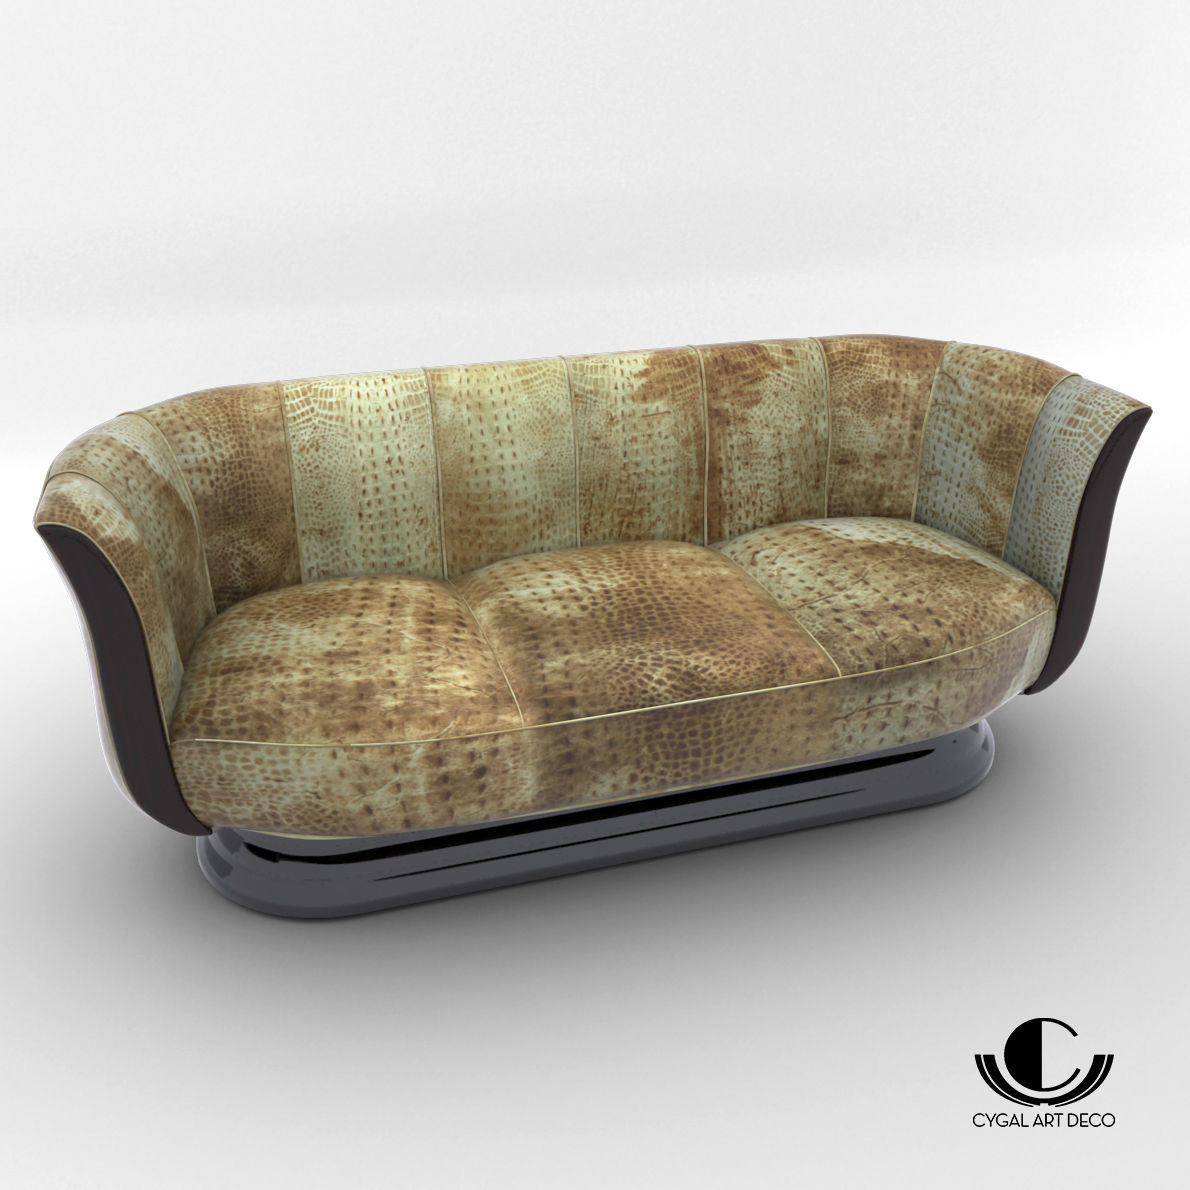 Sofa   Art Deco Style   Design From Cygal Art Deco 3D Model